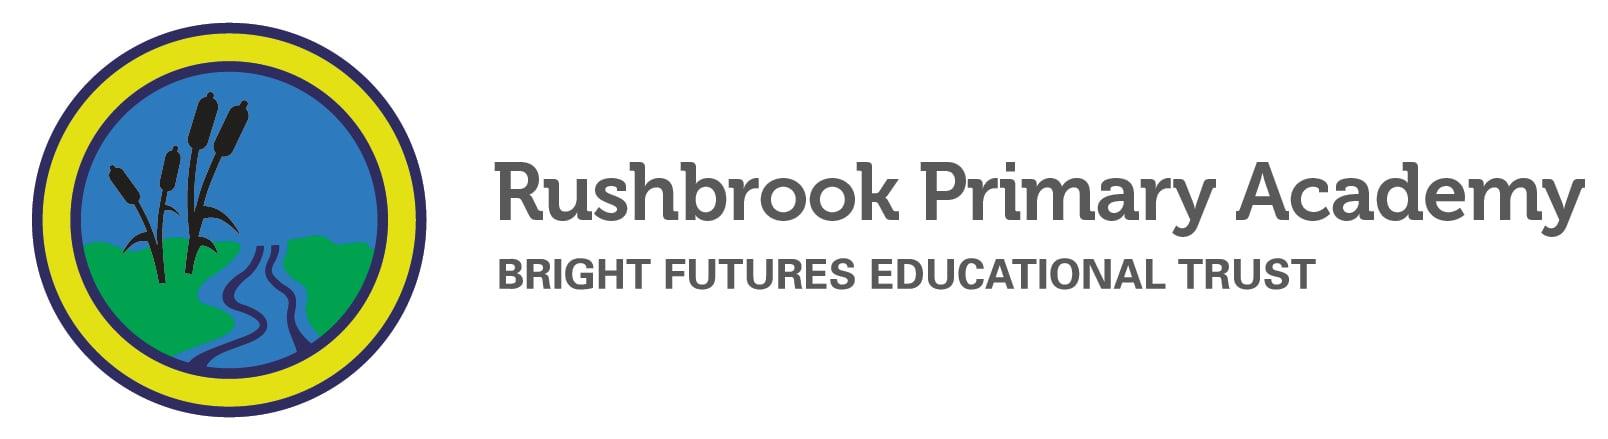 Rushbrook Primary Academy_Logo